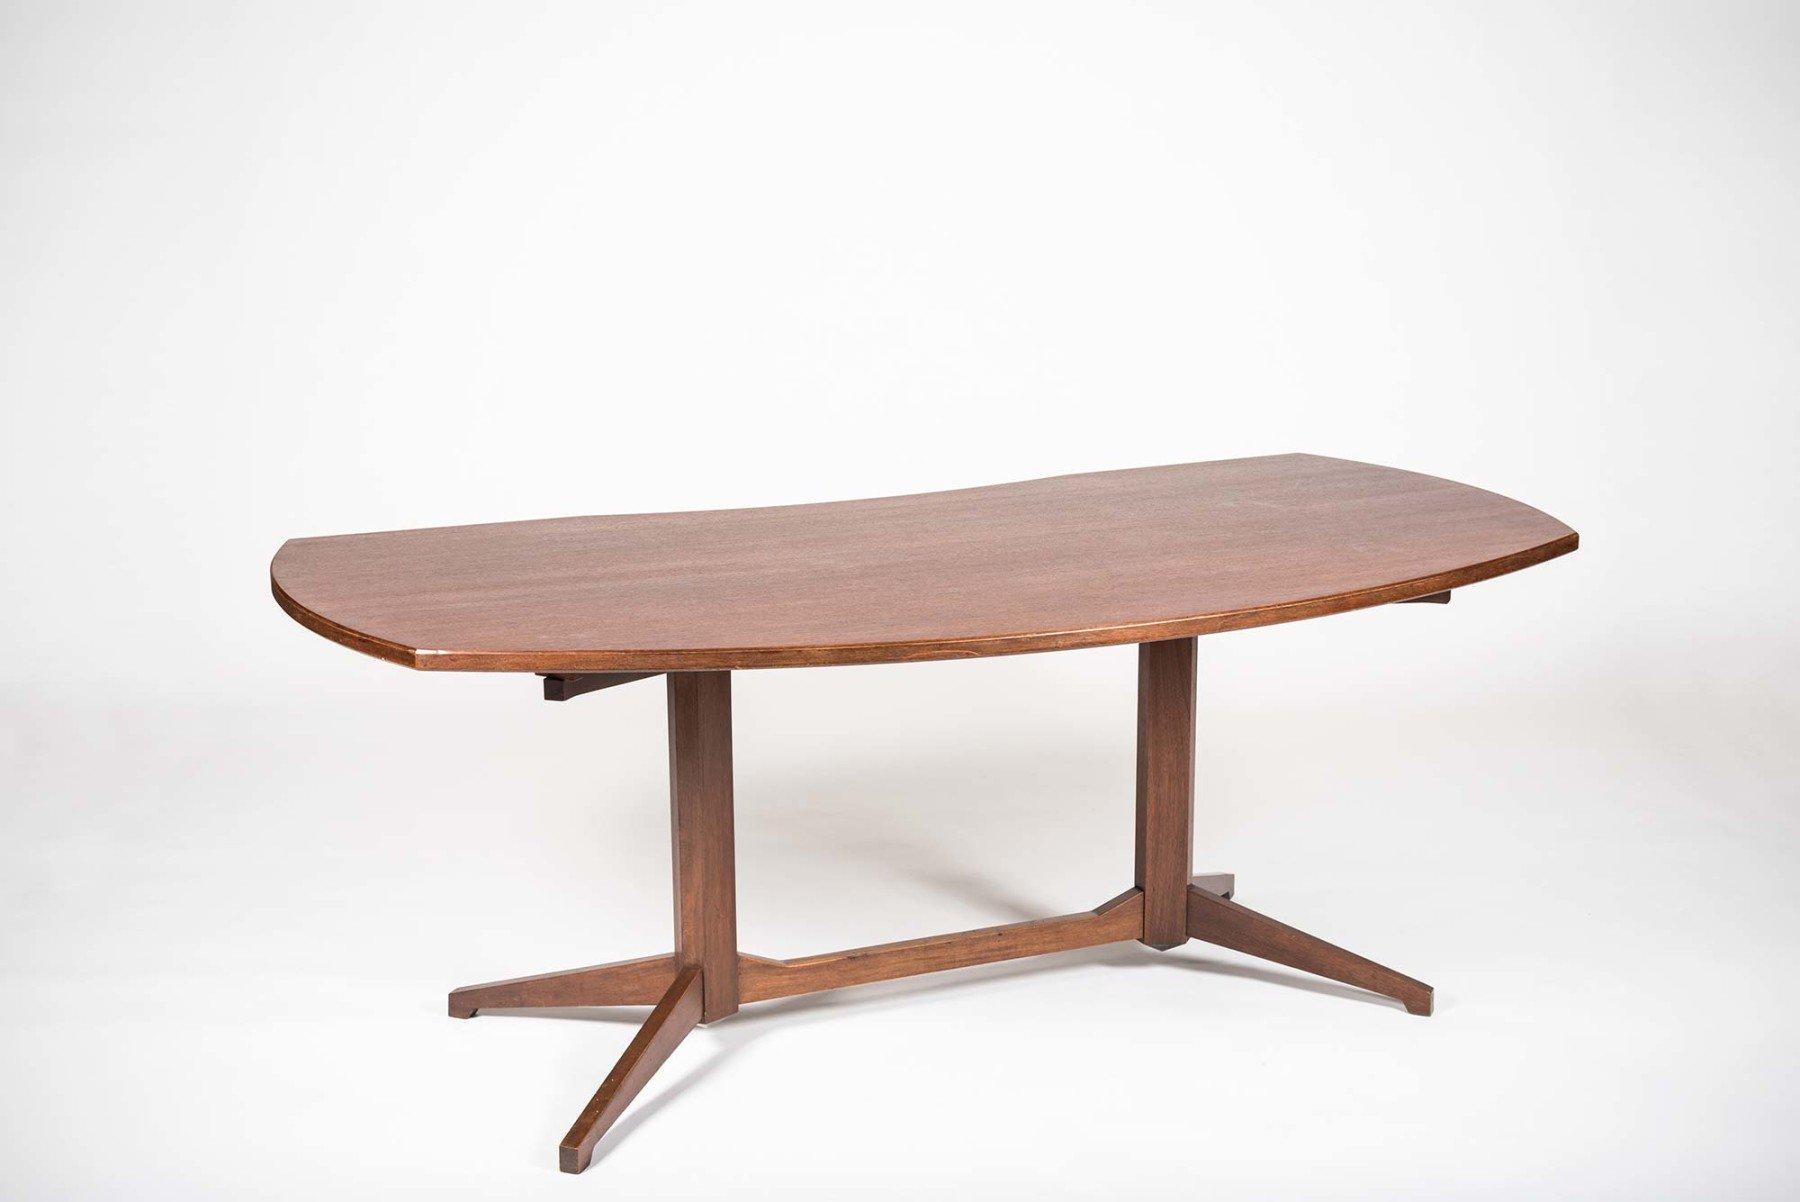 Franco Albini and Franca Helg |  Large desk